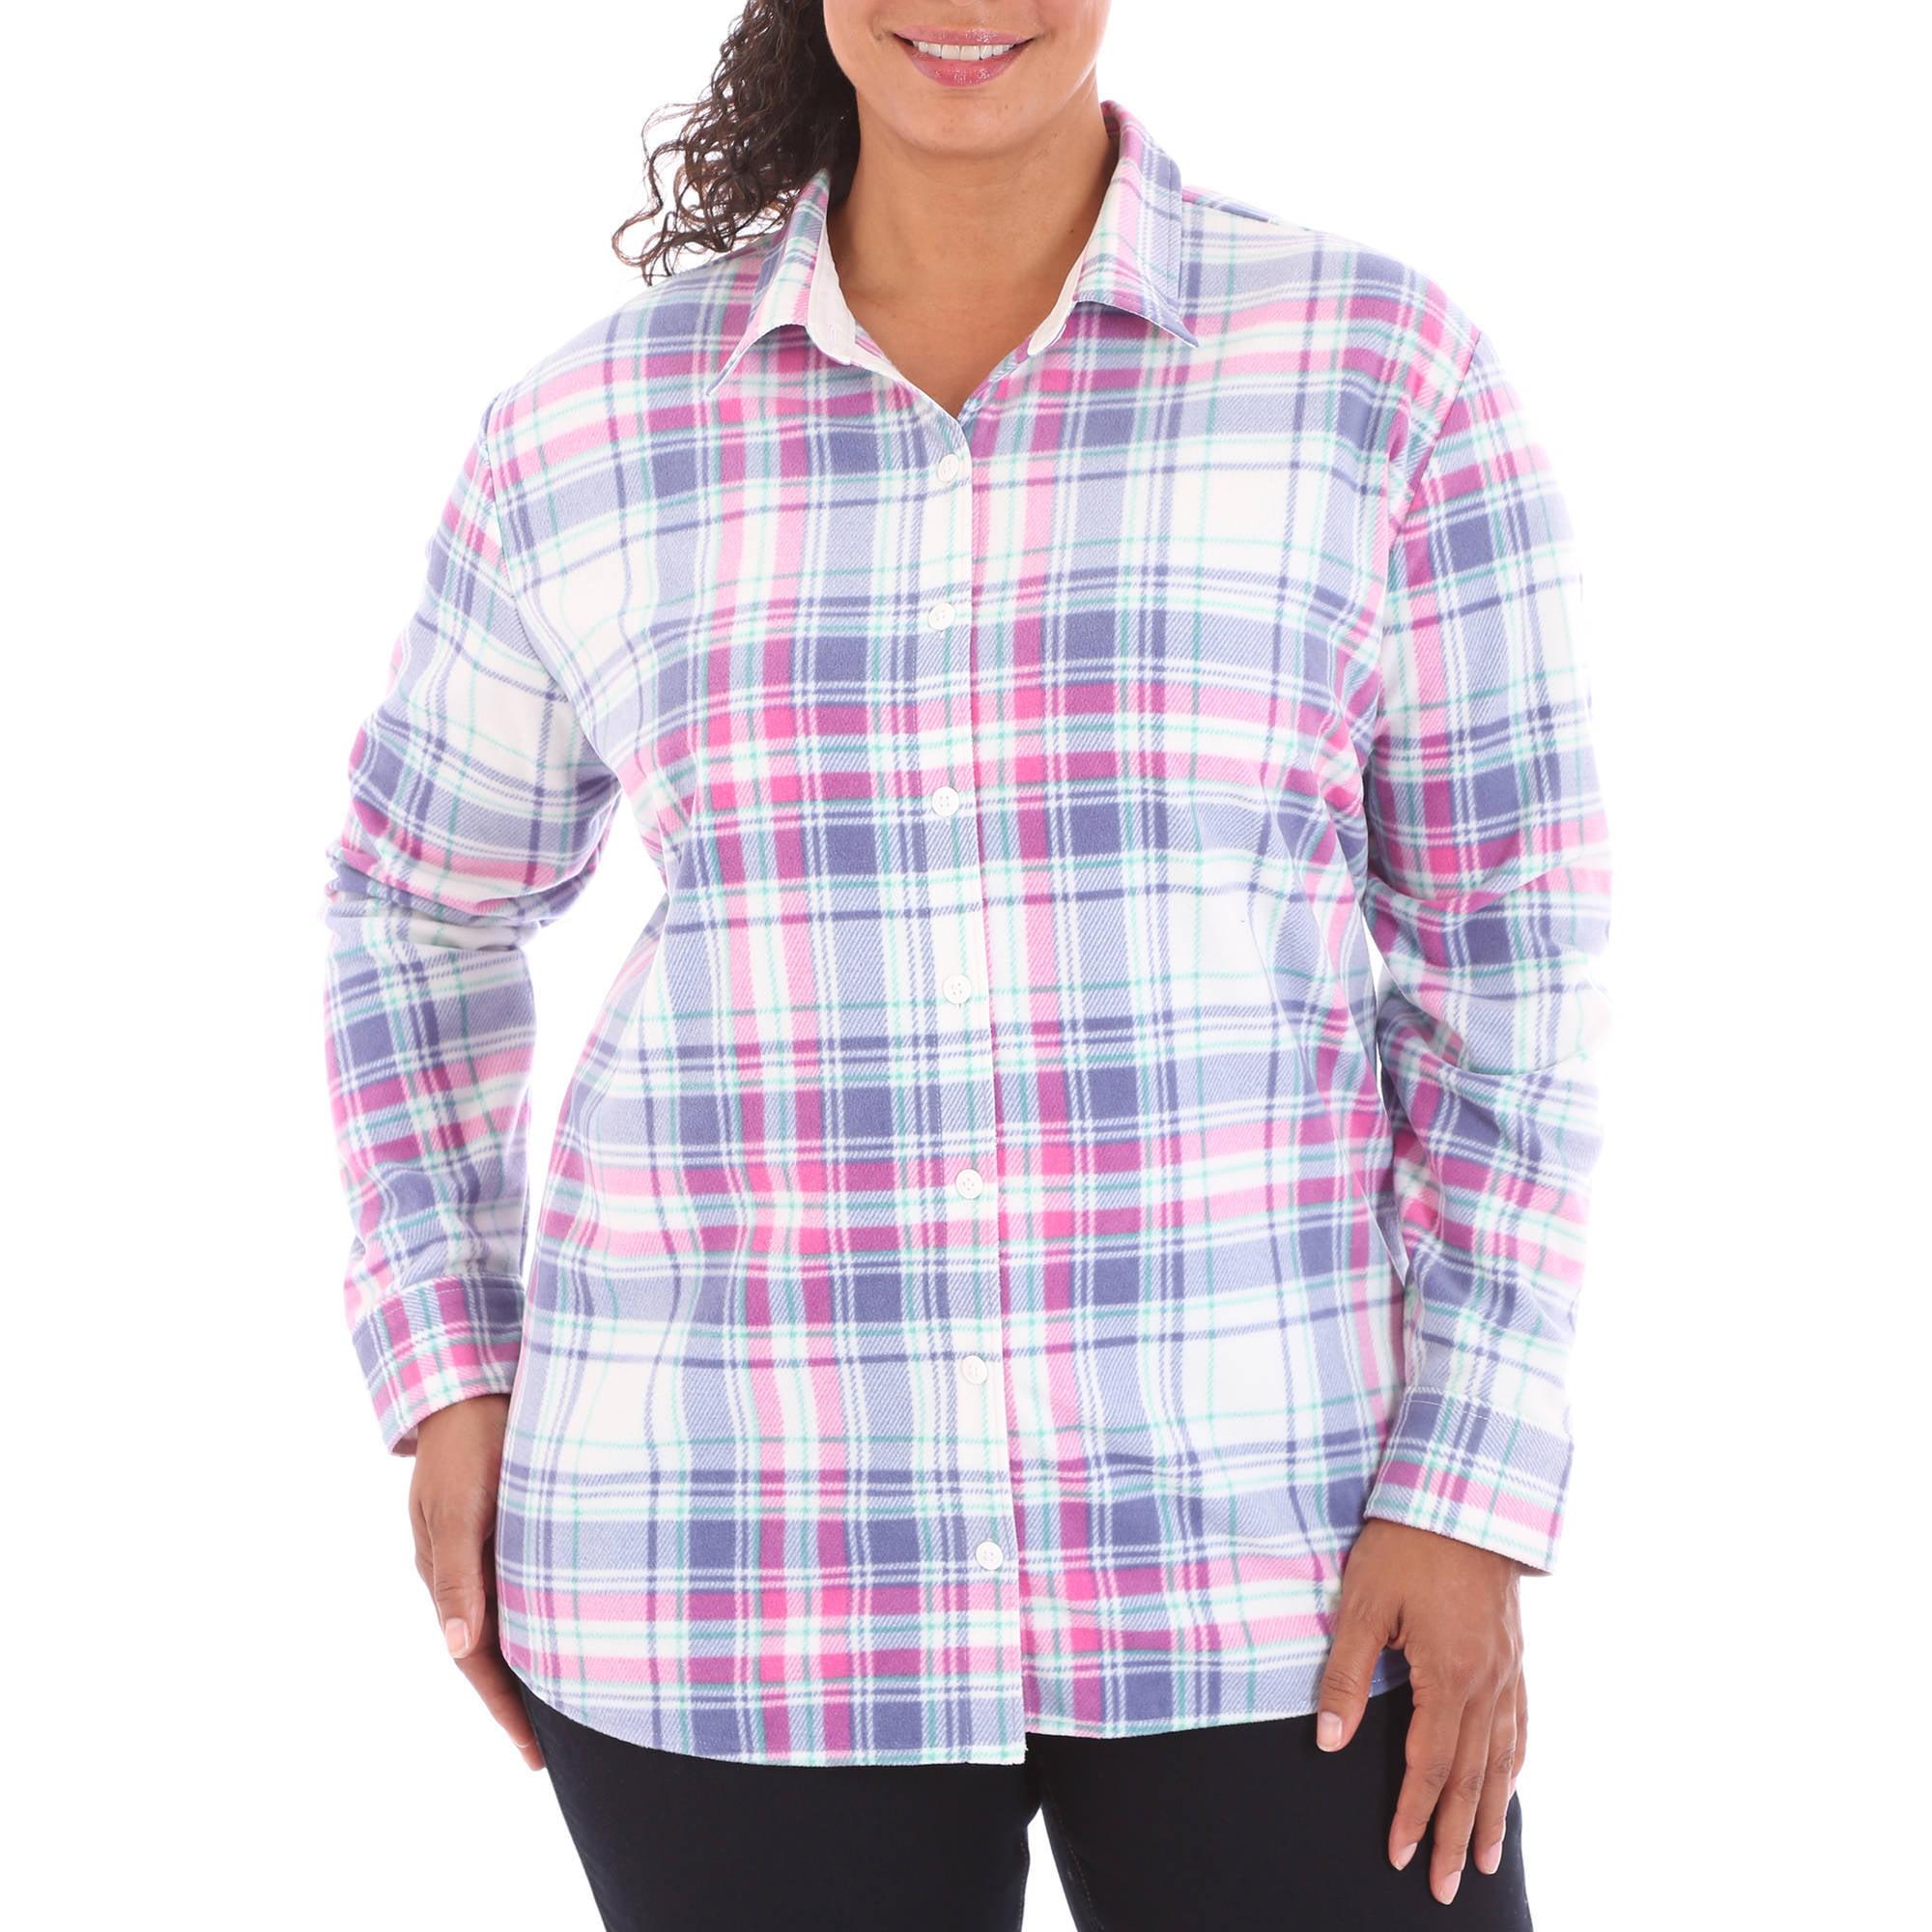 Lee Riders Women S Shirts